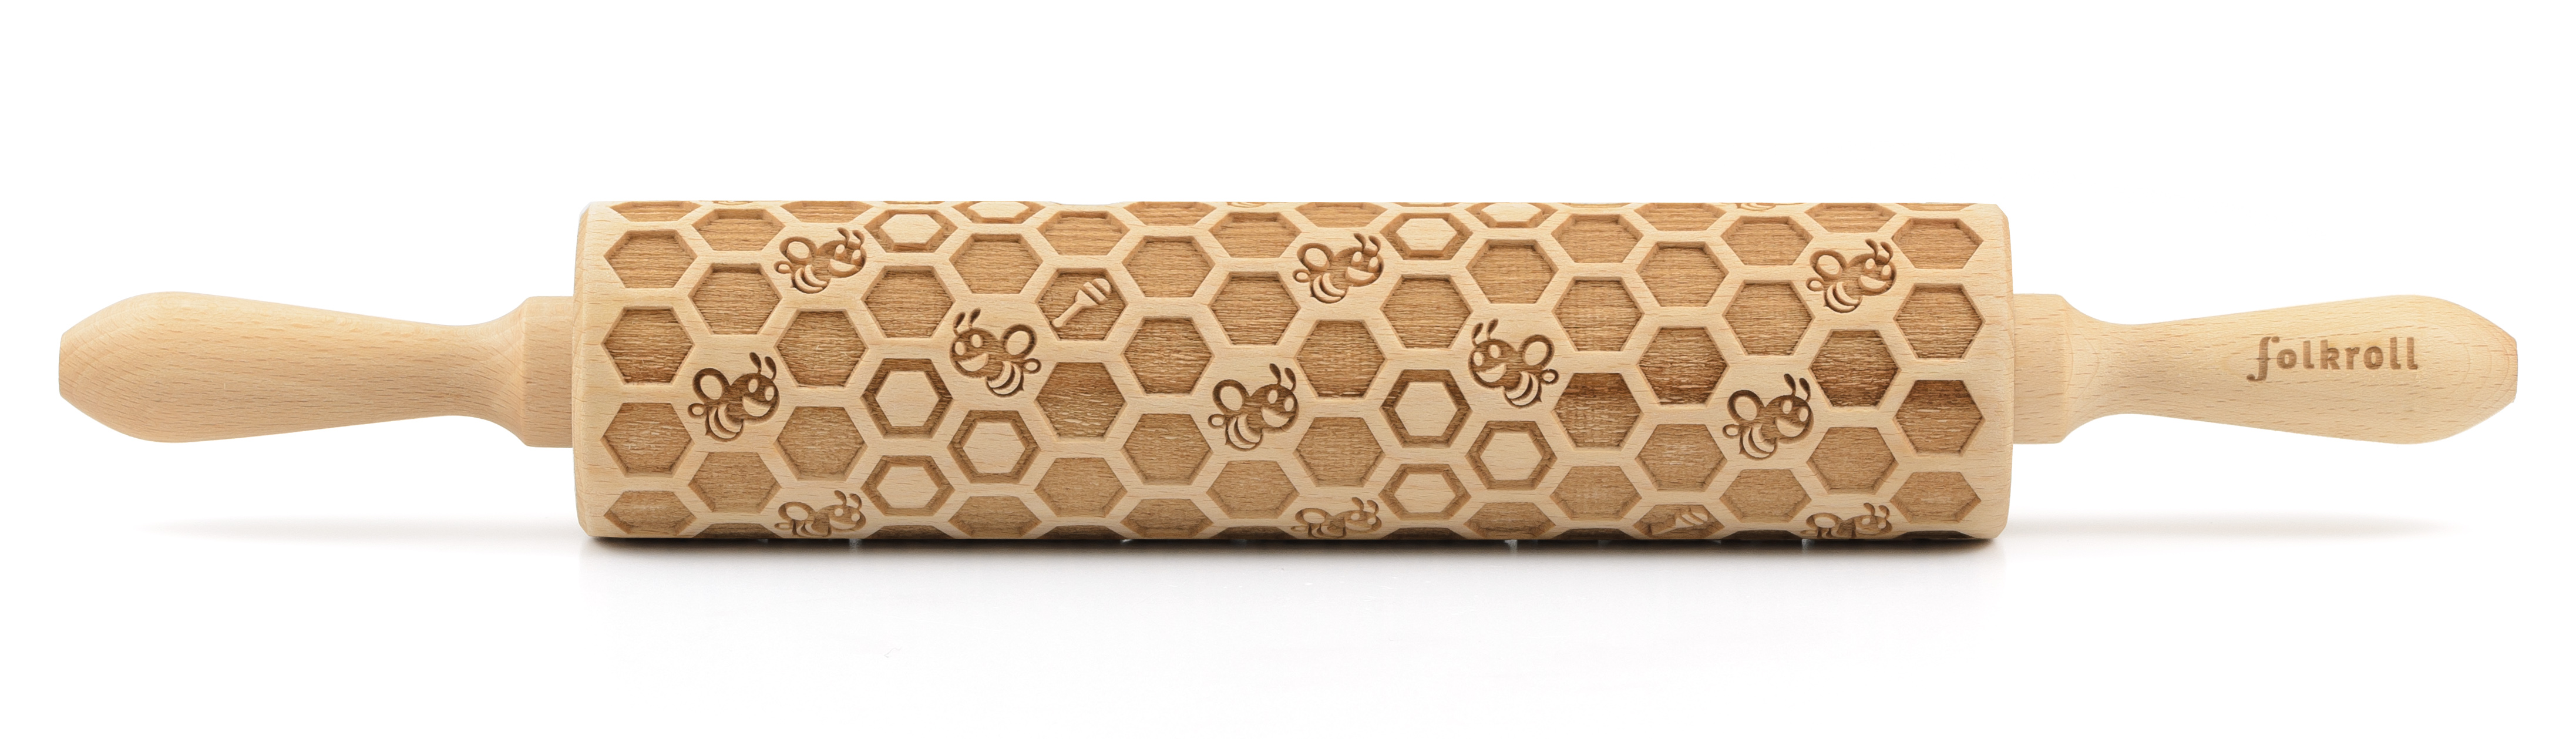 Teigrolle Bienenwaben, Motivroller groß